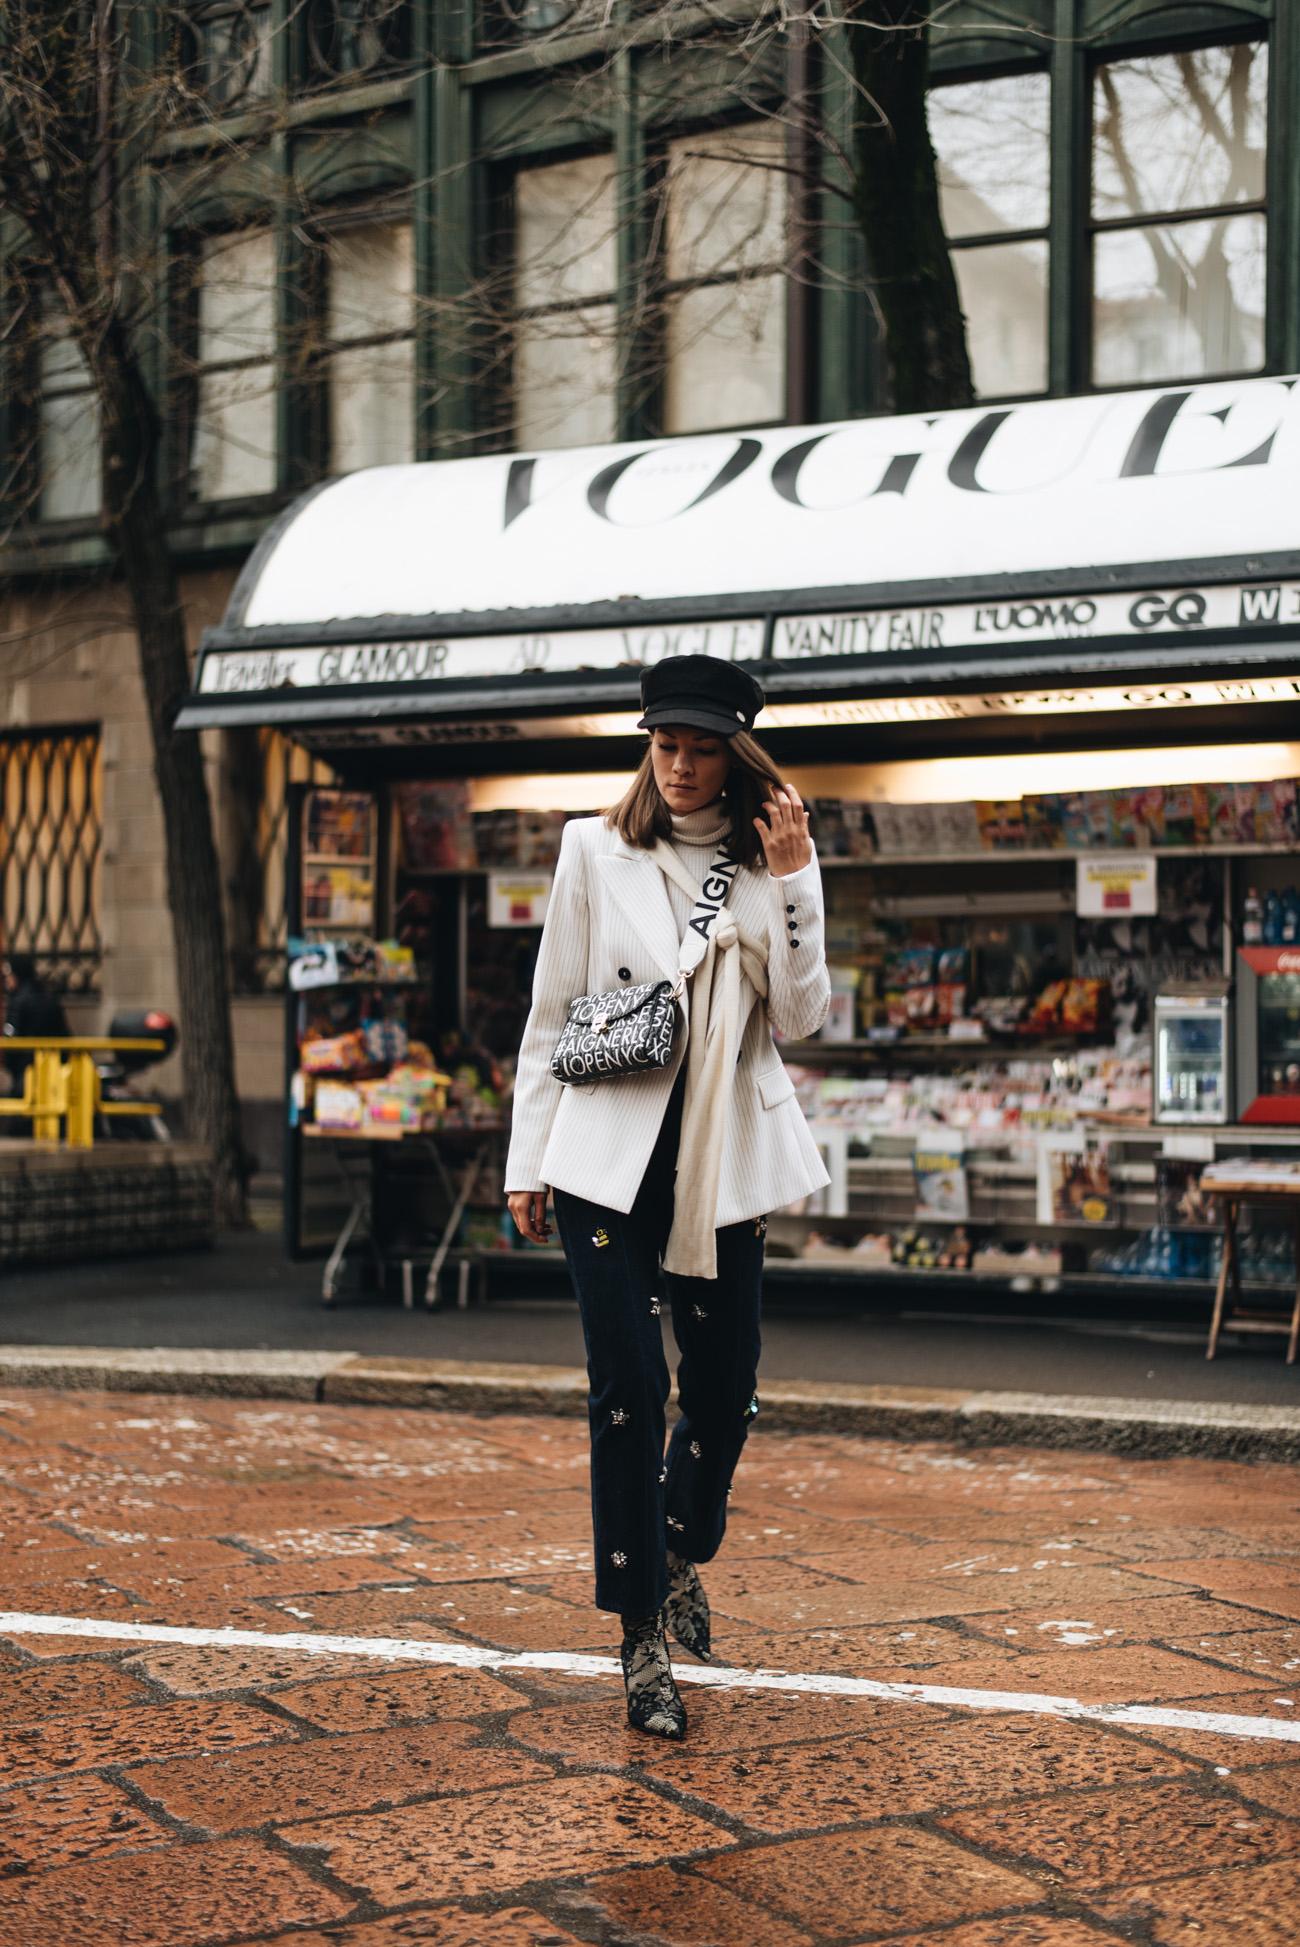 Mailand-Fashion-Week-Streetstyle-Sock-Boots-Lace-Spitzen-material-nina-schwichtenberg-fashiioncarpet